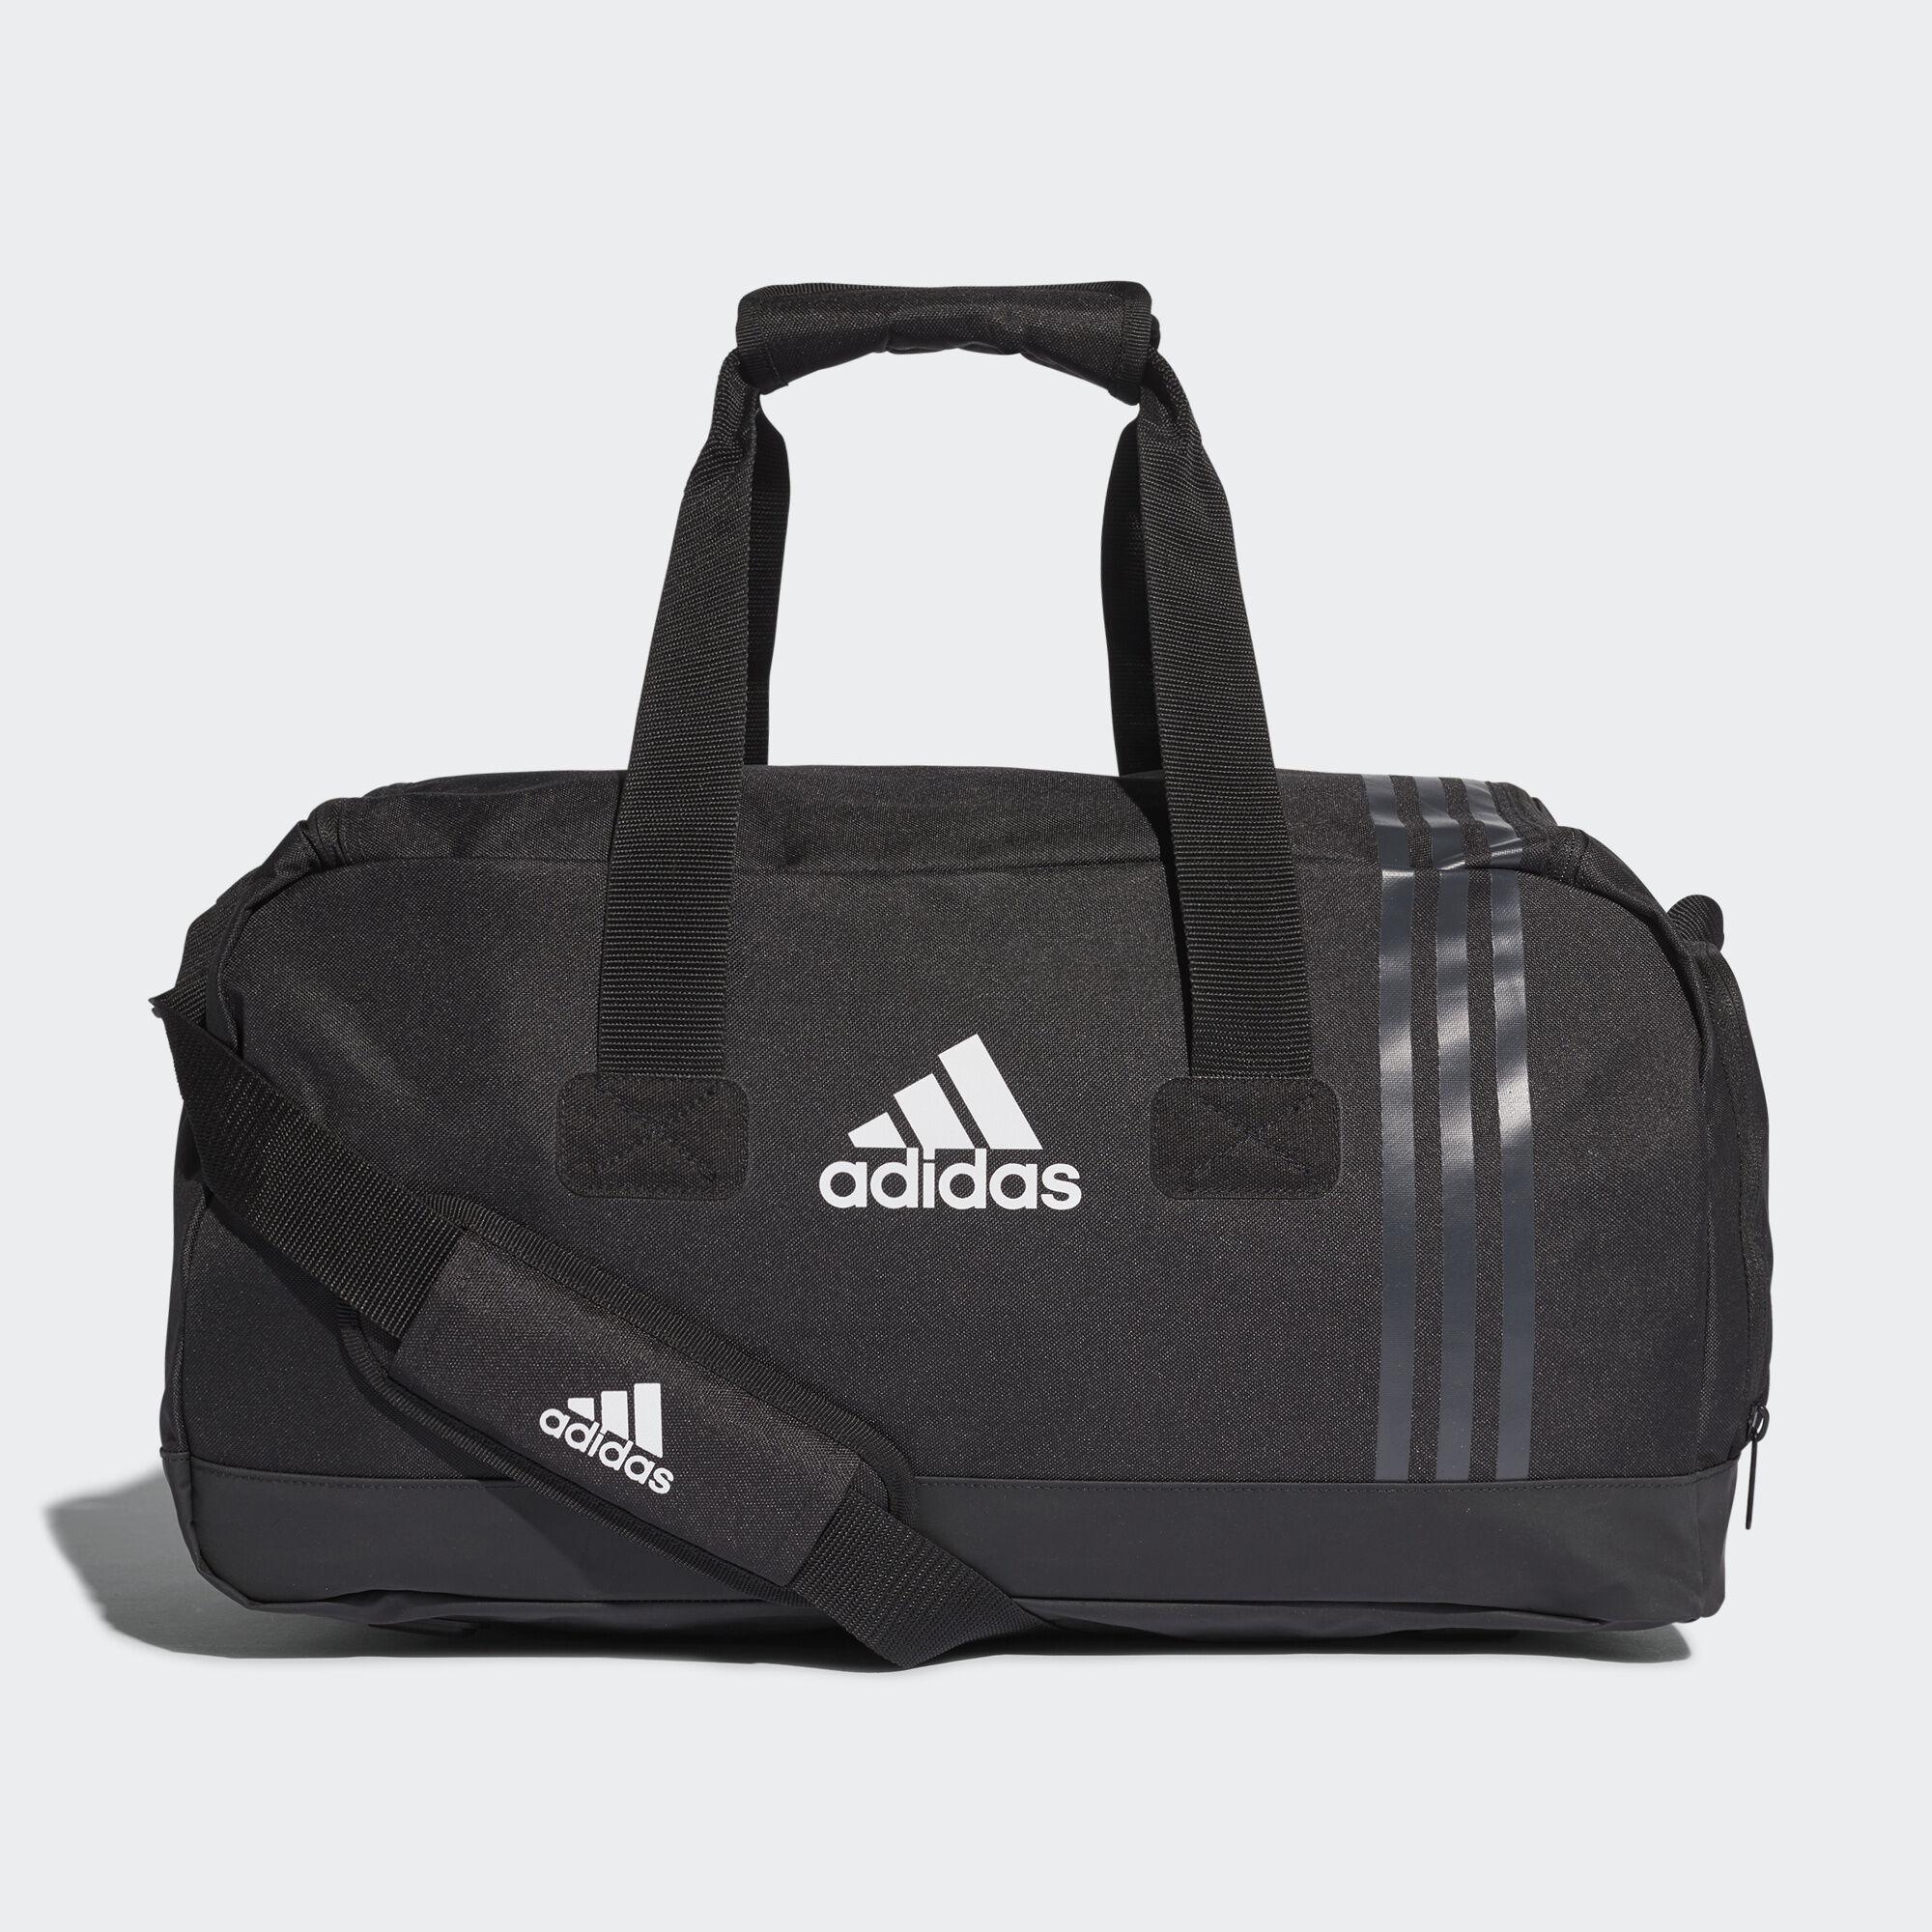 adidas , Bolsa de deporte pequeña Tiro Black/Dark Grey/White B46128